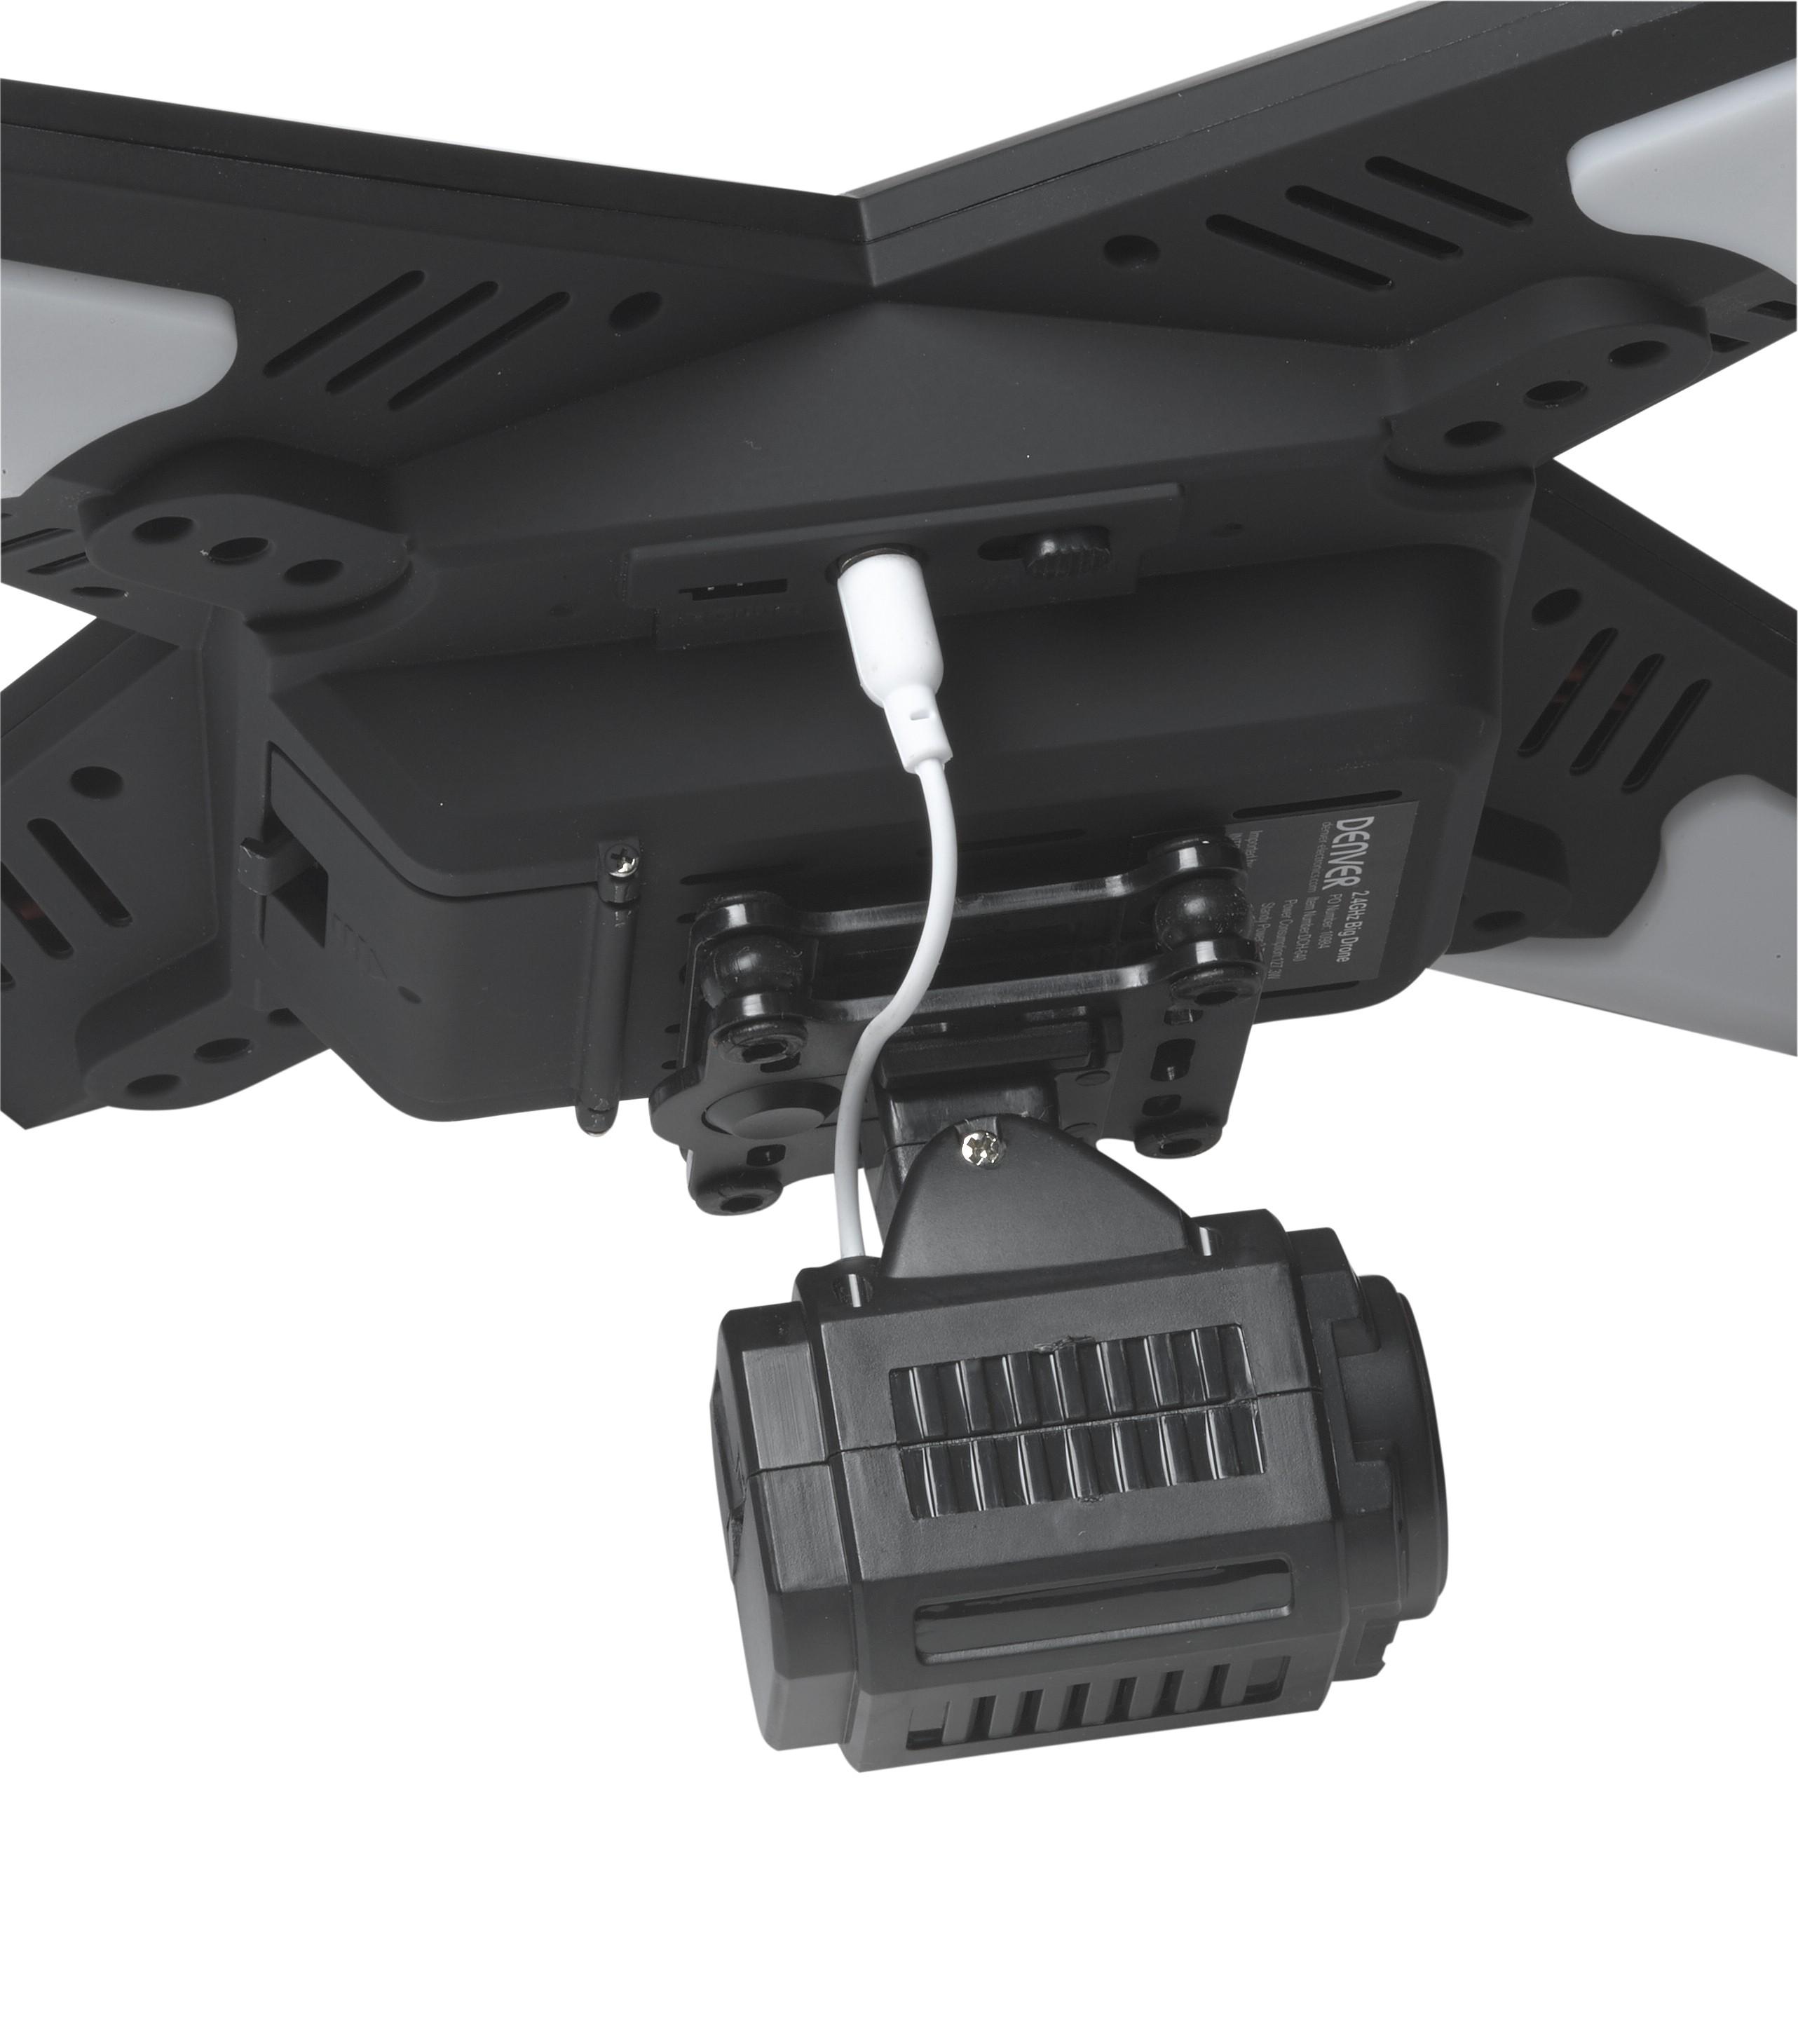 drone denver dch640 hd